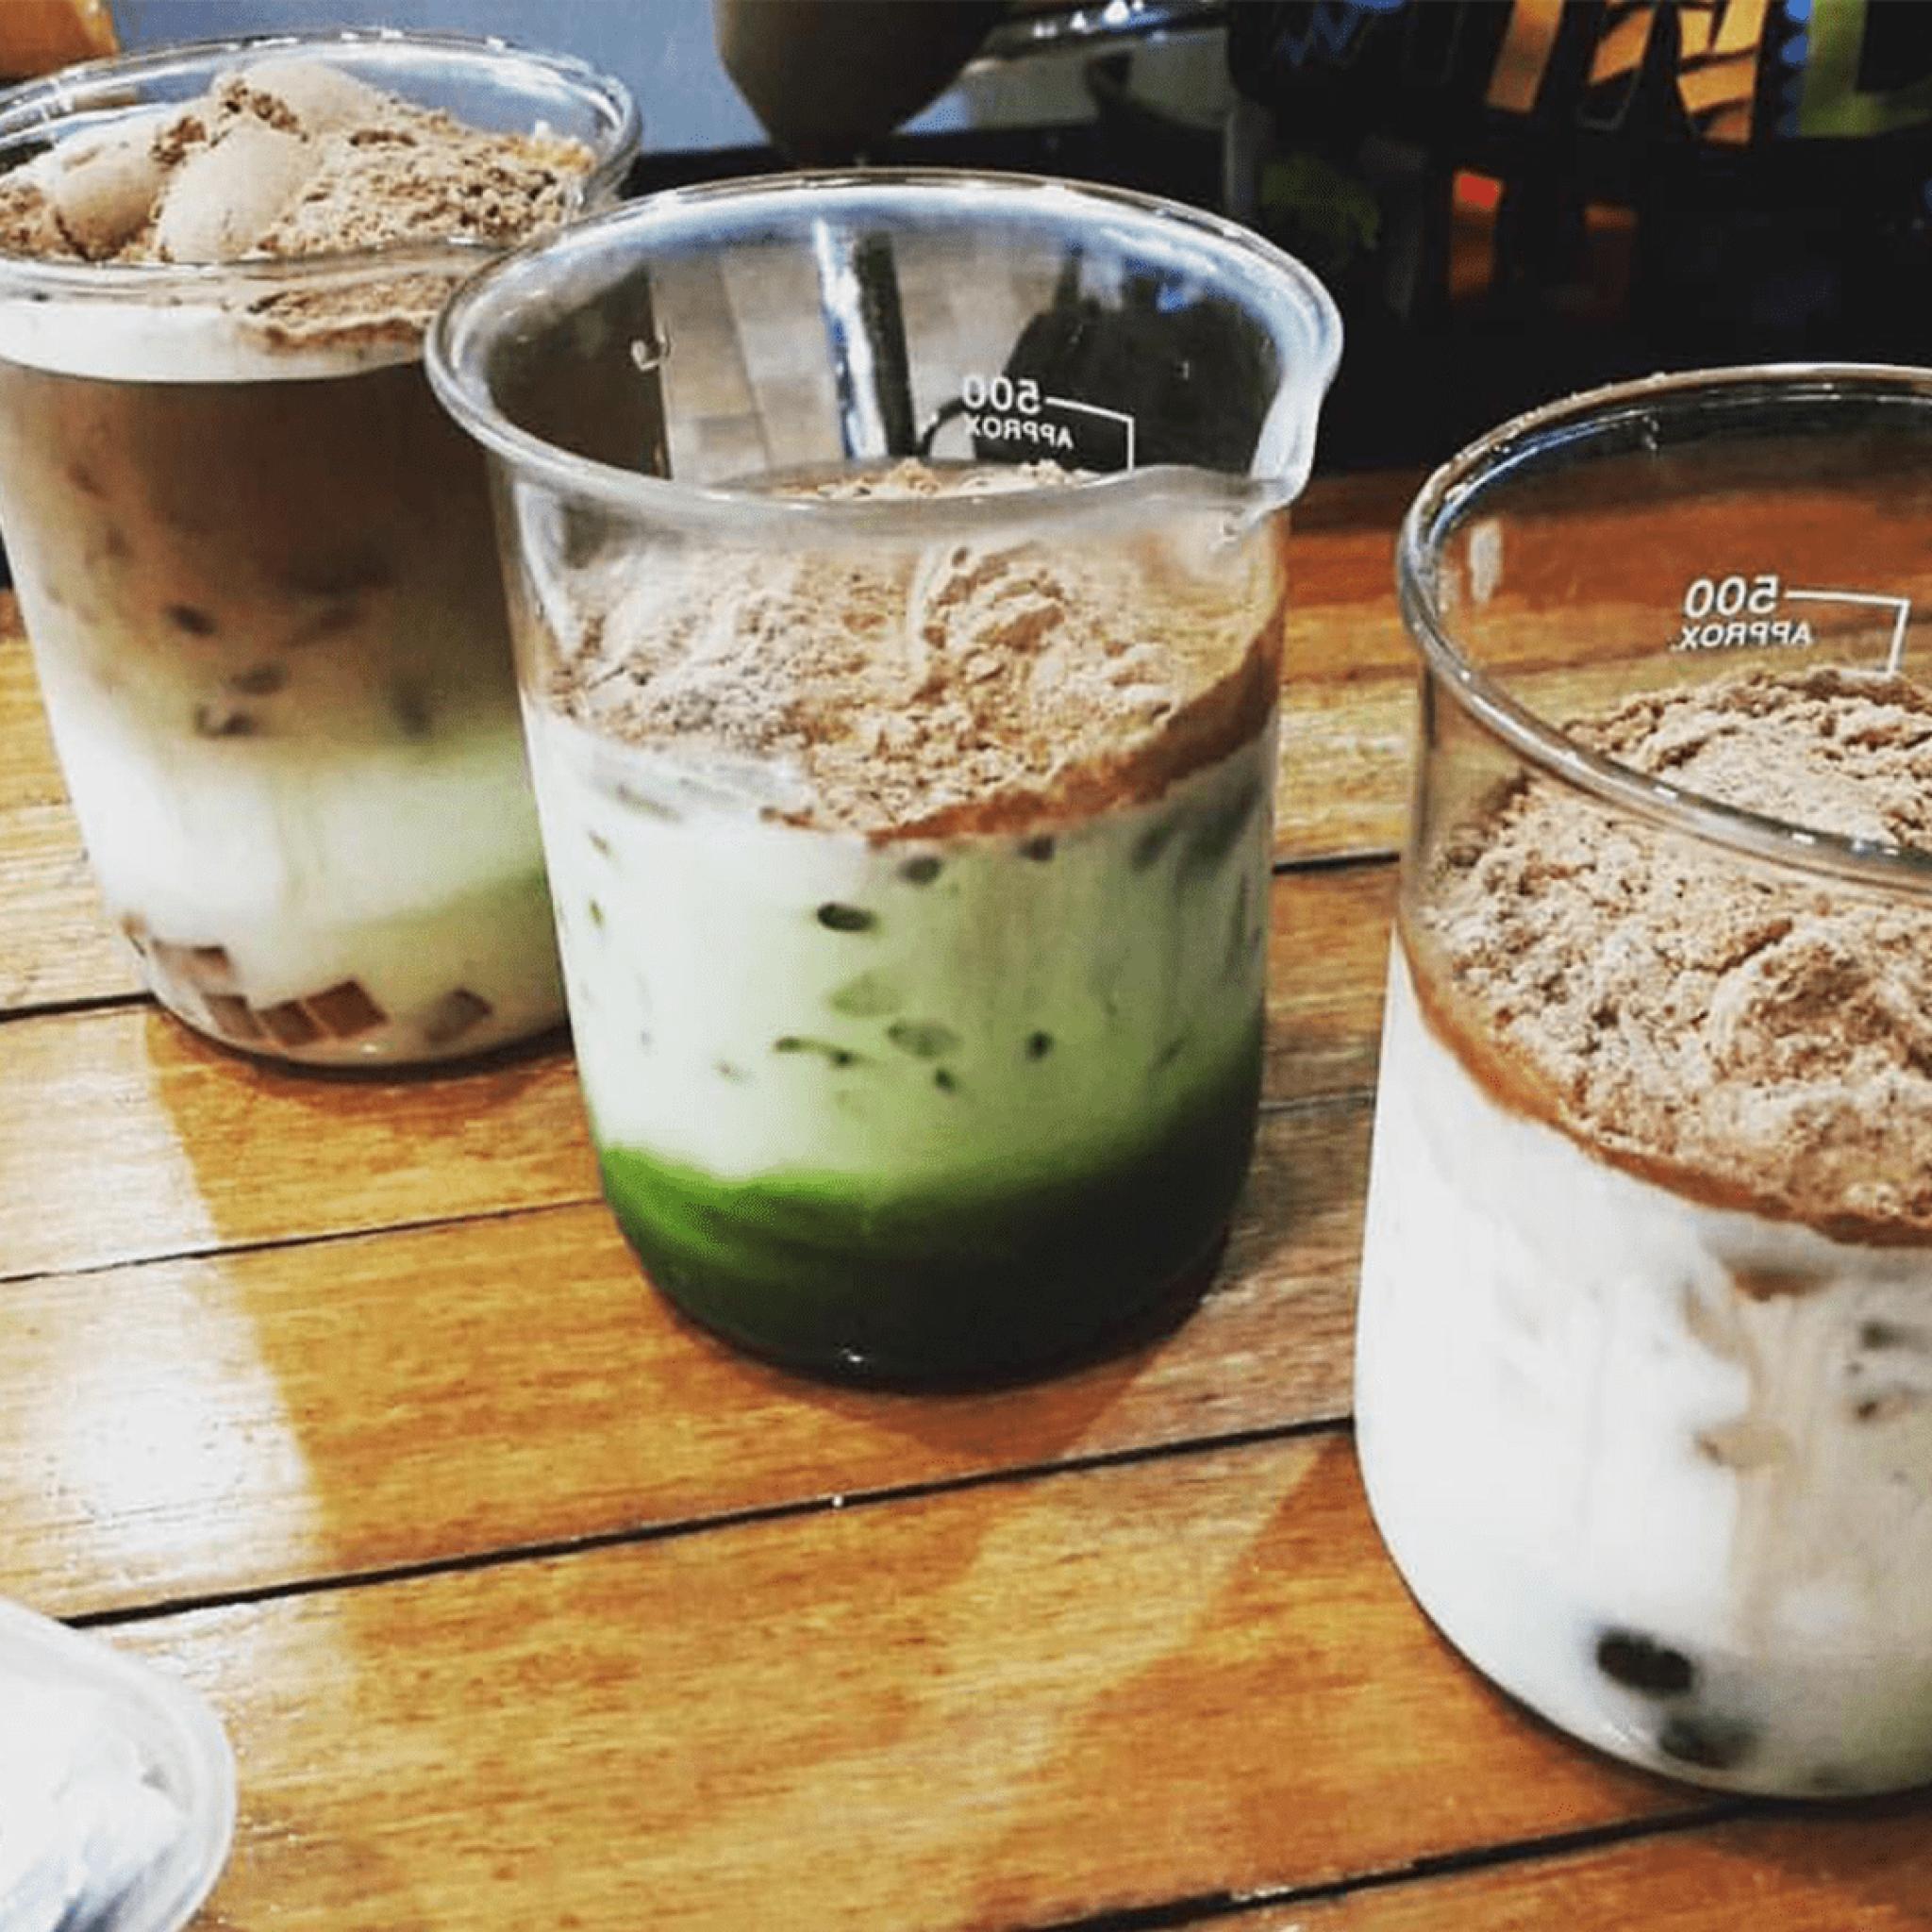 Best Milk Tea Shops In Manila: Here Are The Bestsellers